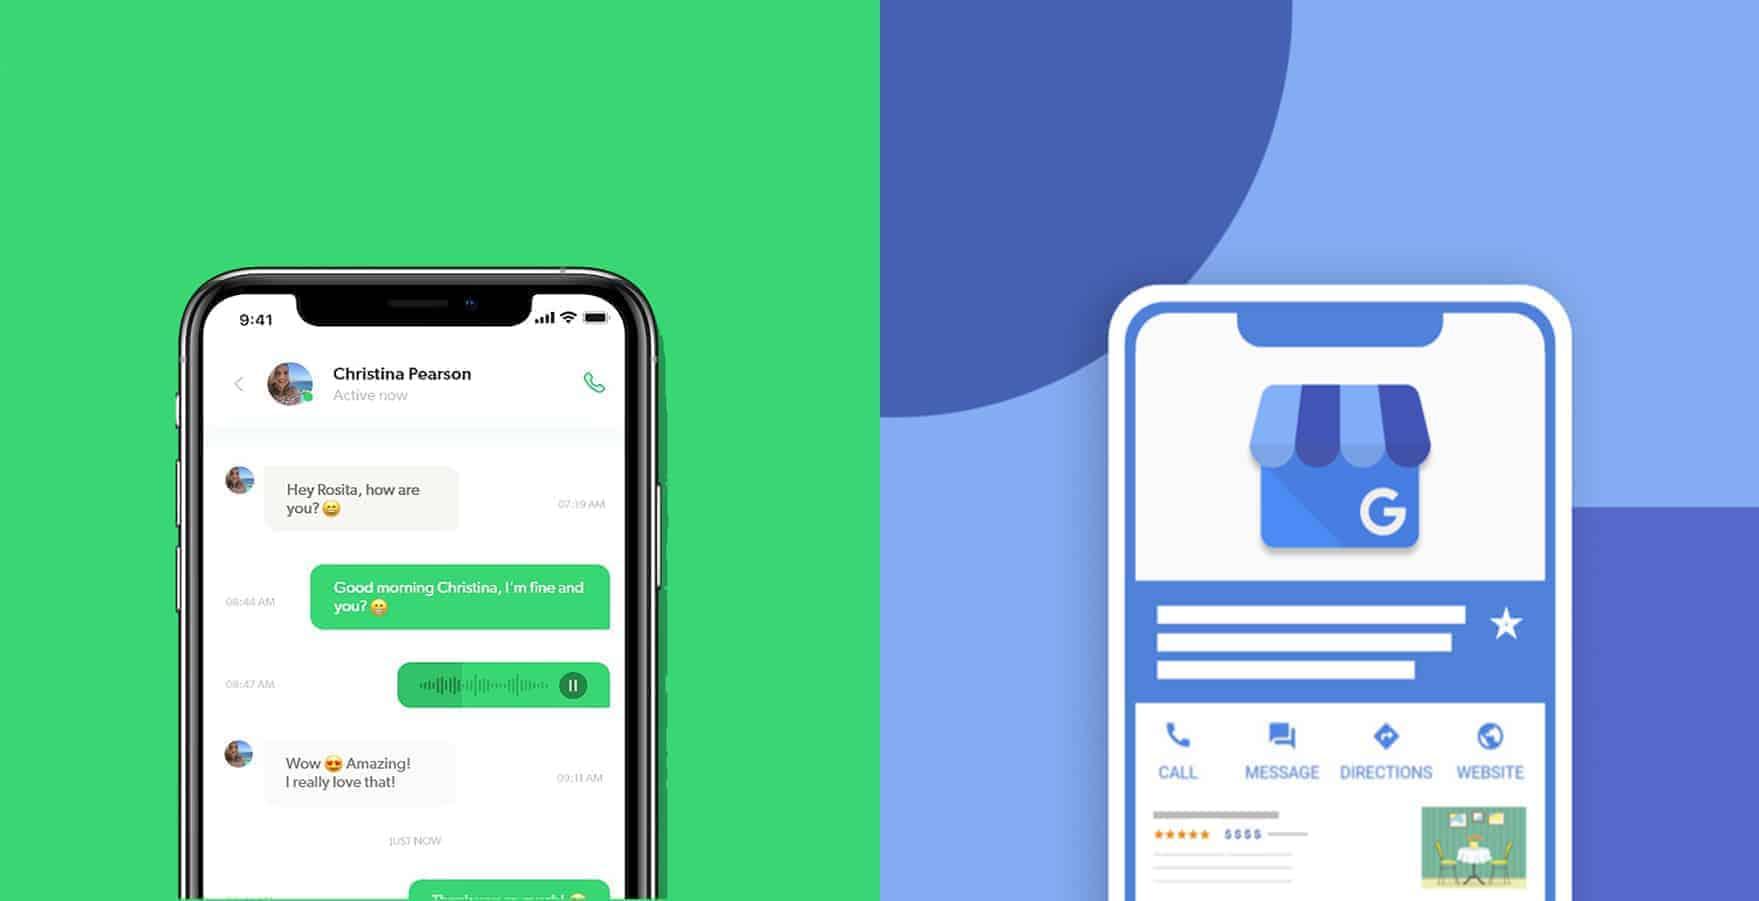 WhatsApp Business vs Google My Business